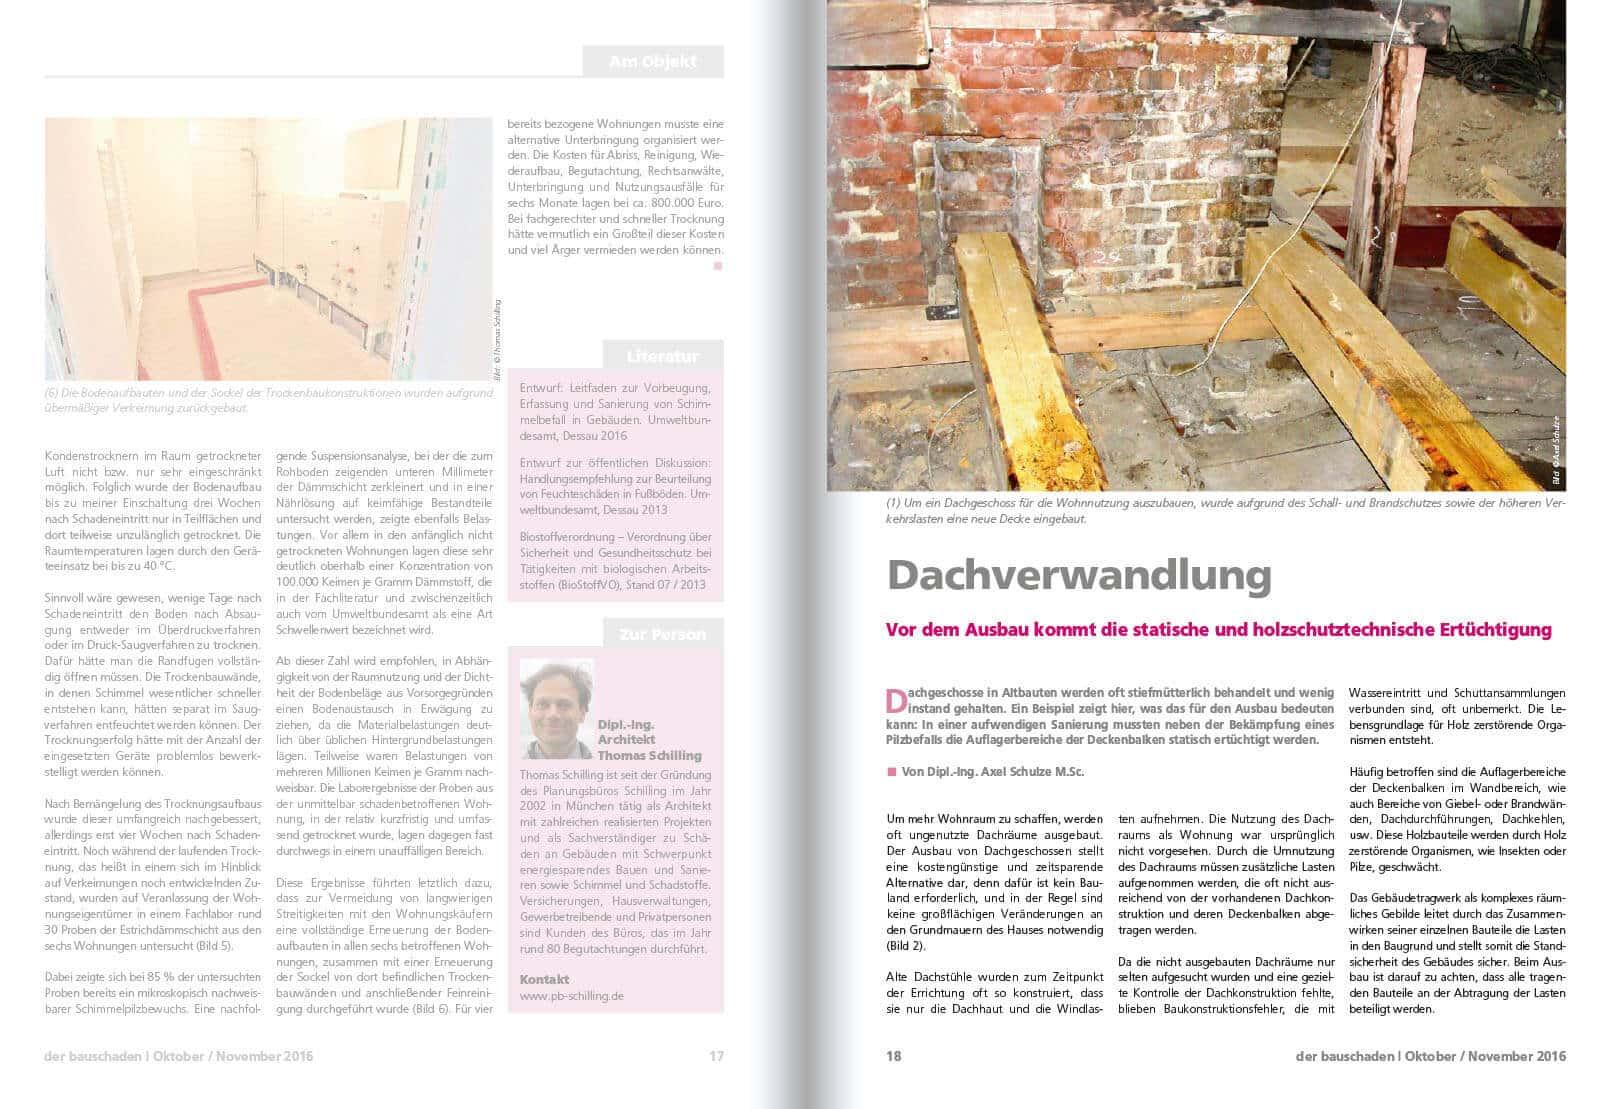 2016-10_Dachverwandlung_001